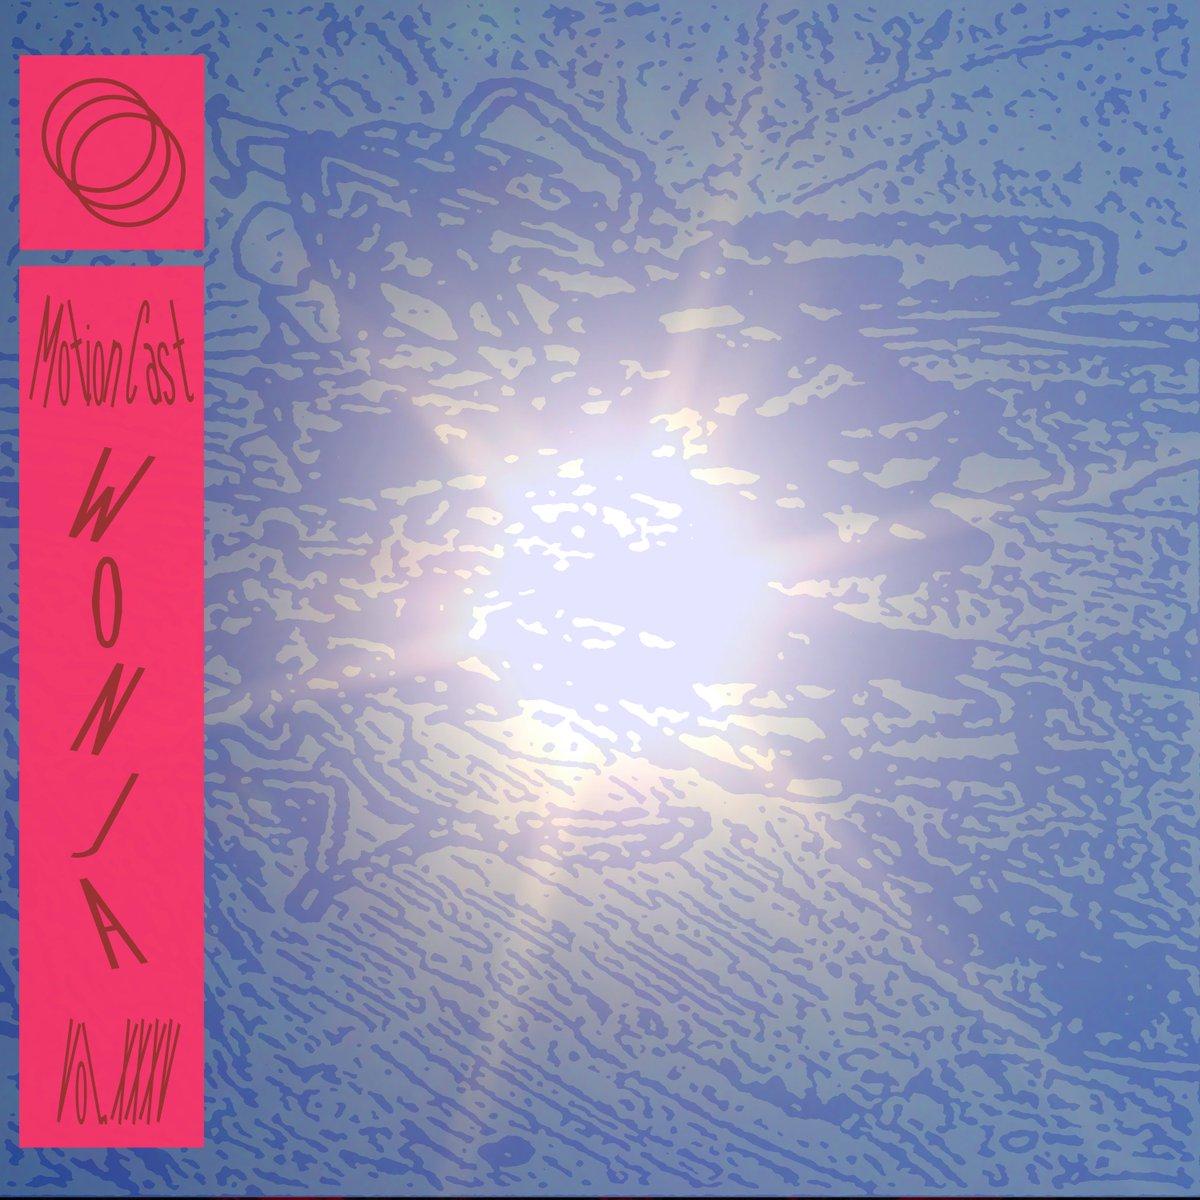 Vol. 35: @wonja soundcloud.com/motion-ward/mo…